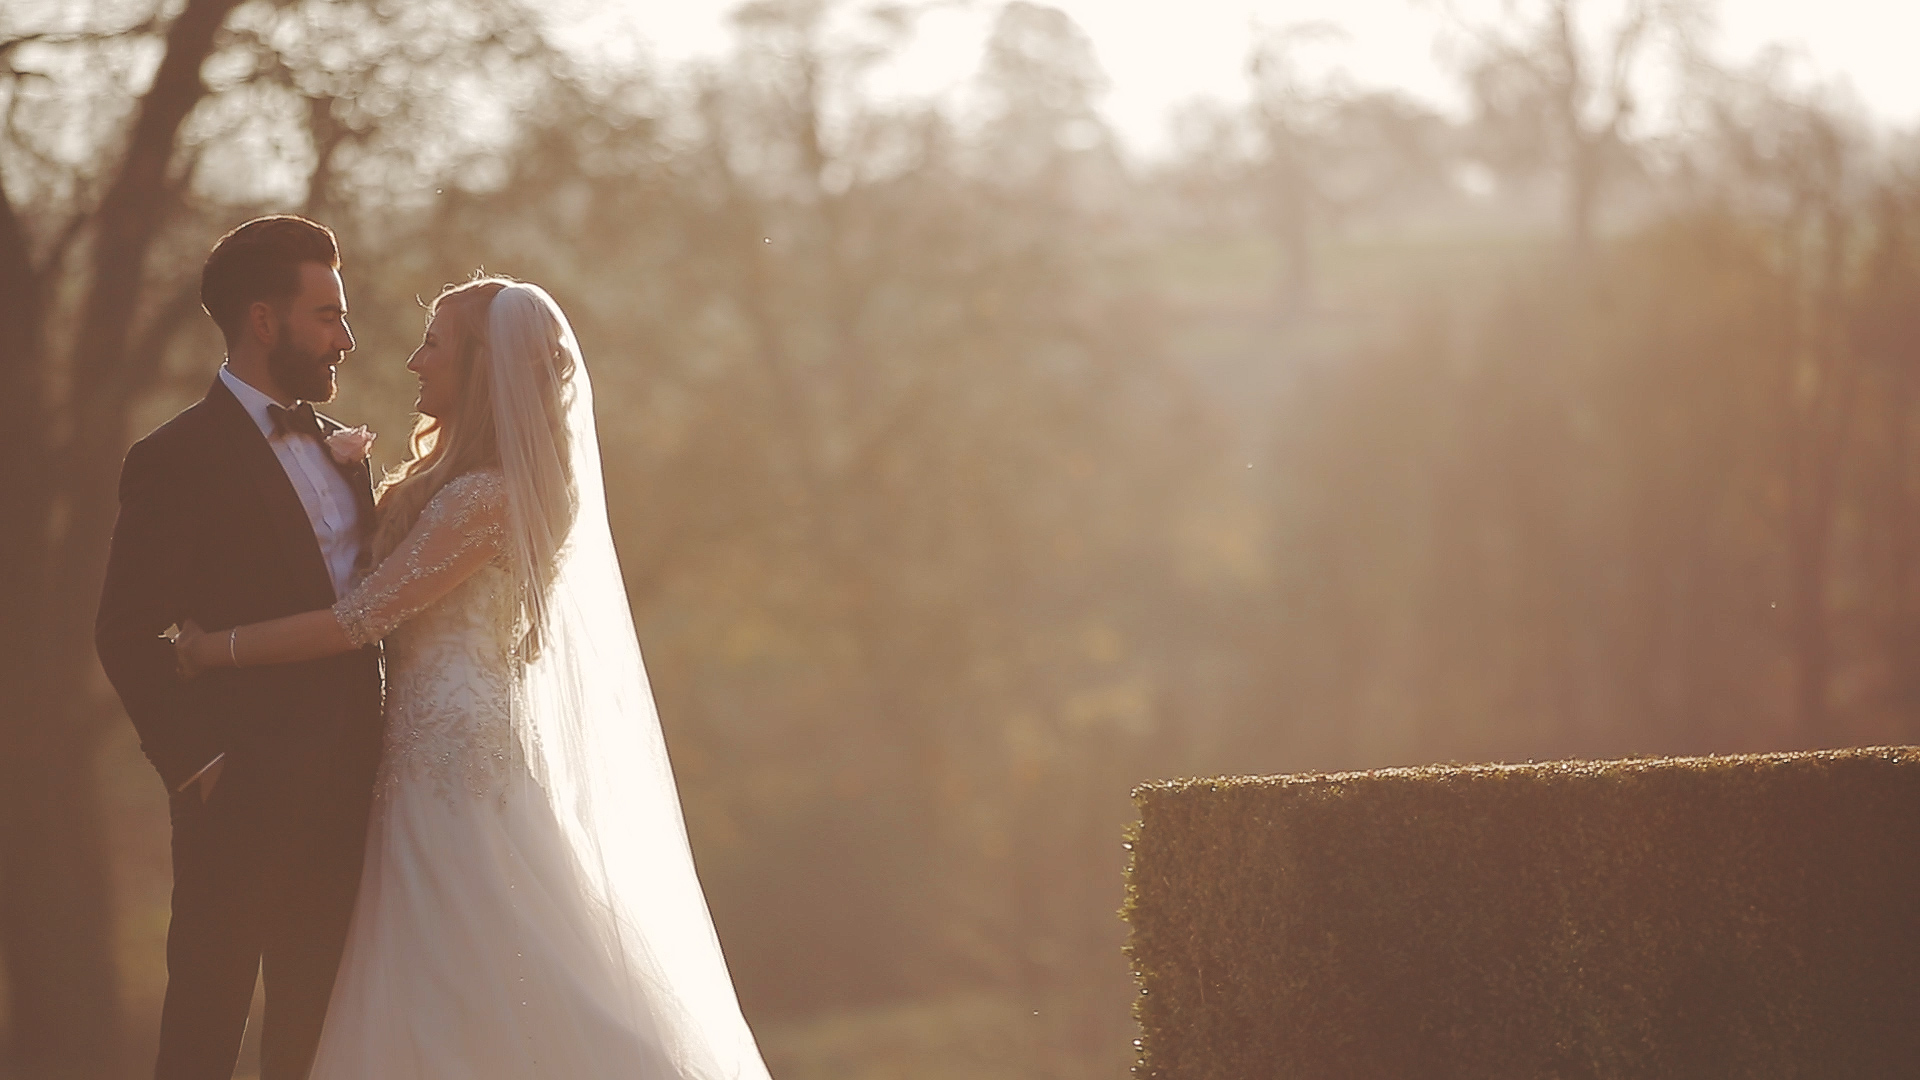 Rushton Hall wedding video